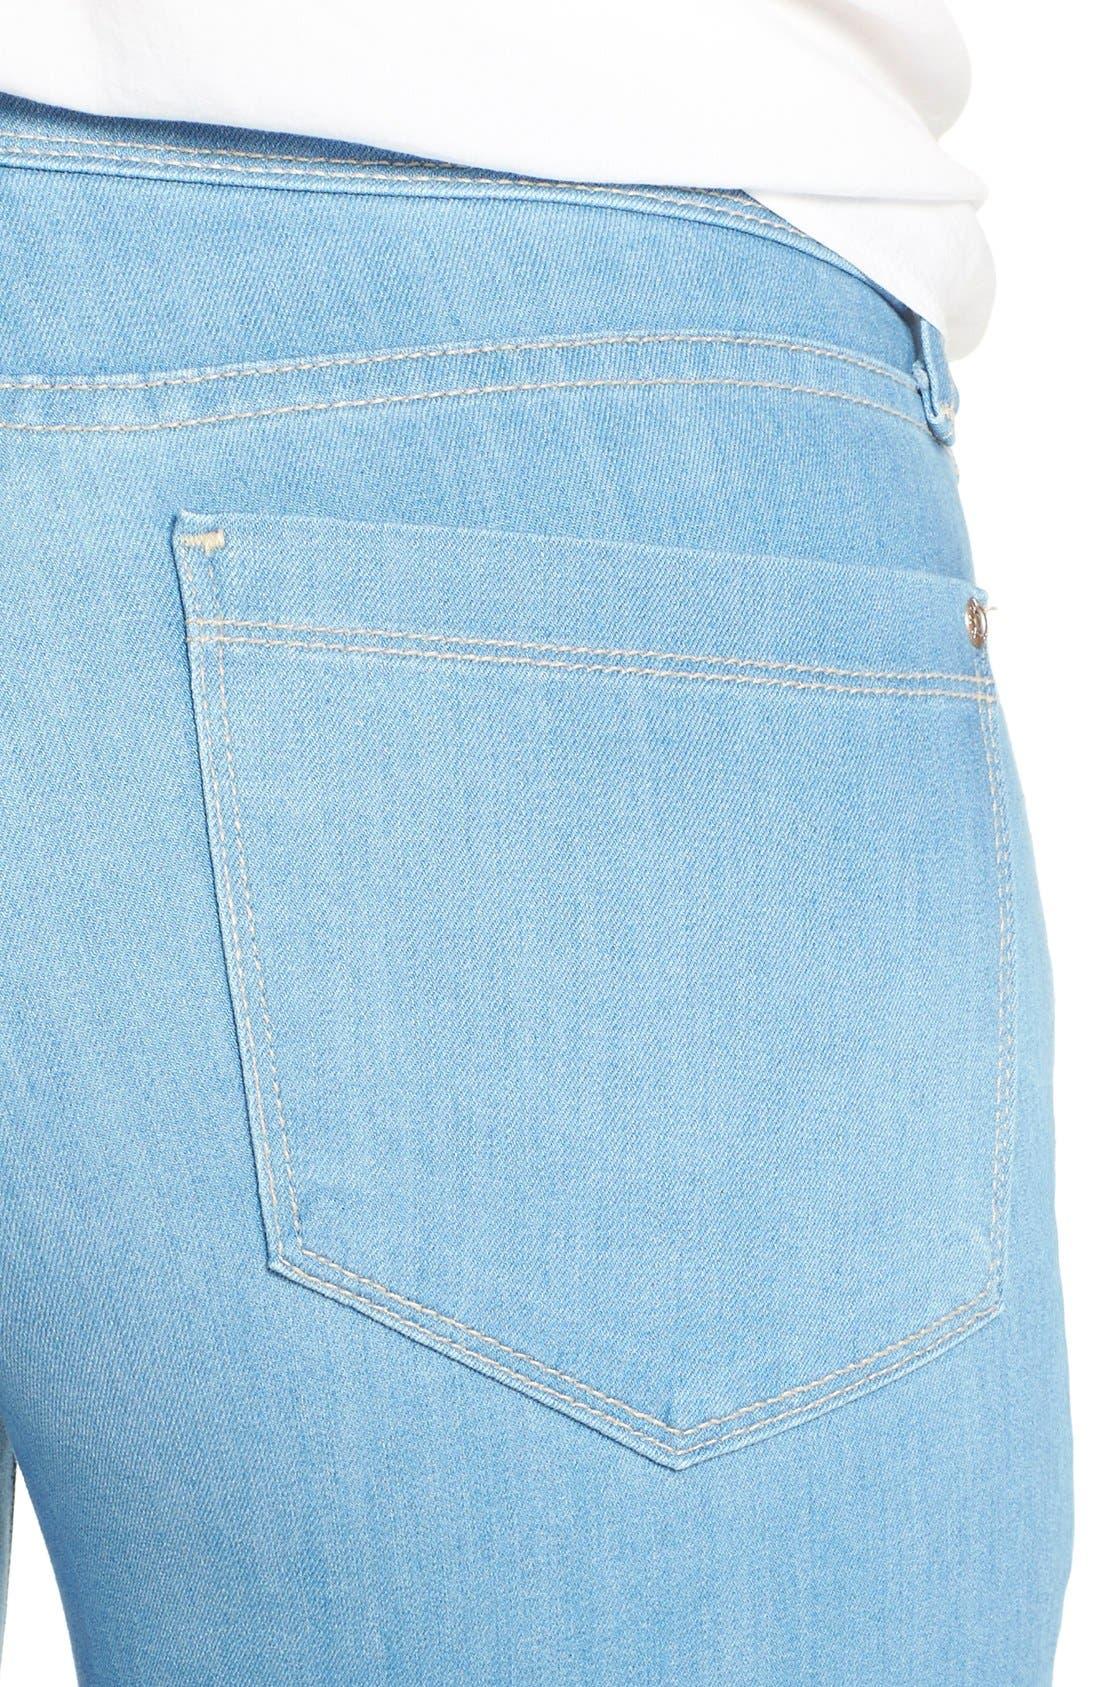 Alternate Image 4  - NYDJ 'Barbara' Stretch Bootcut Jeans (Palm Bay)